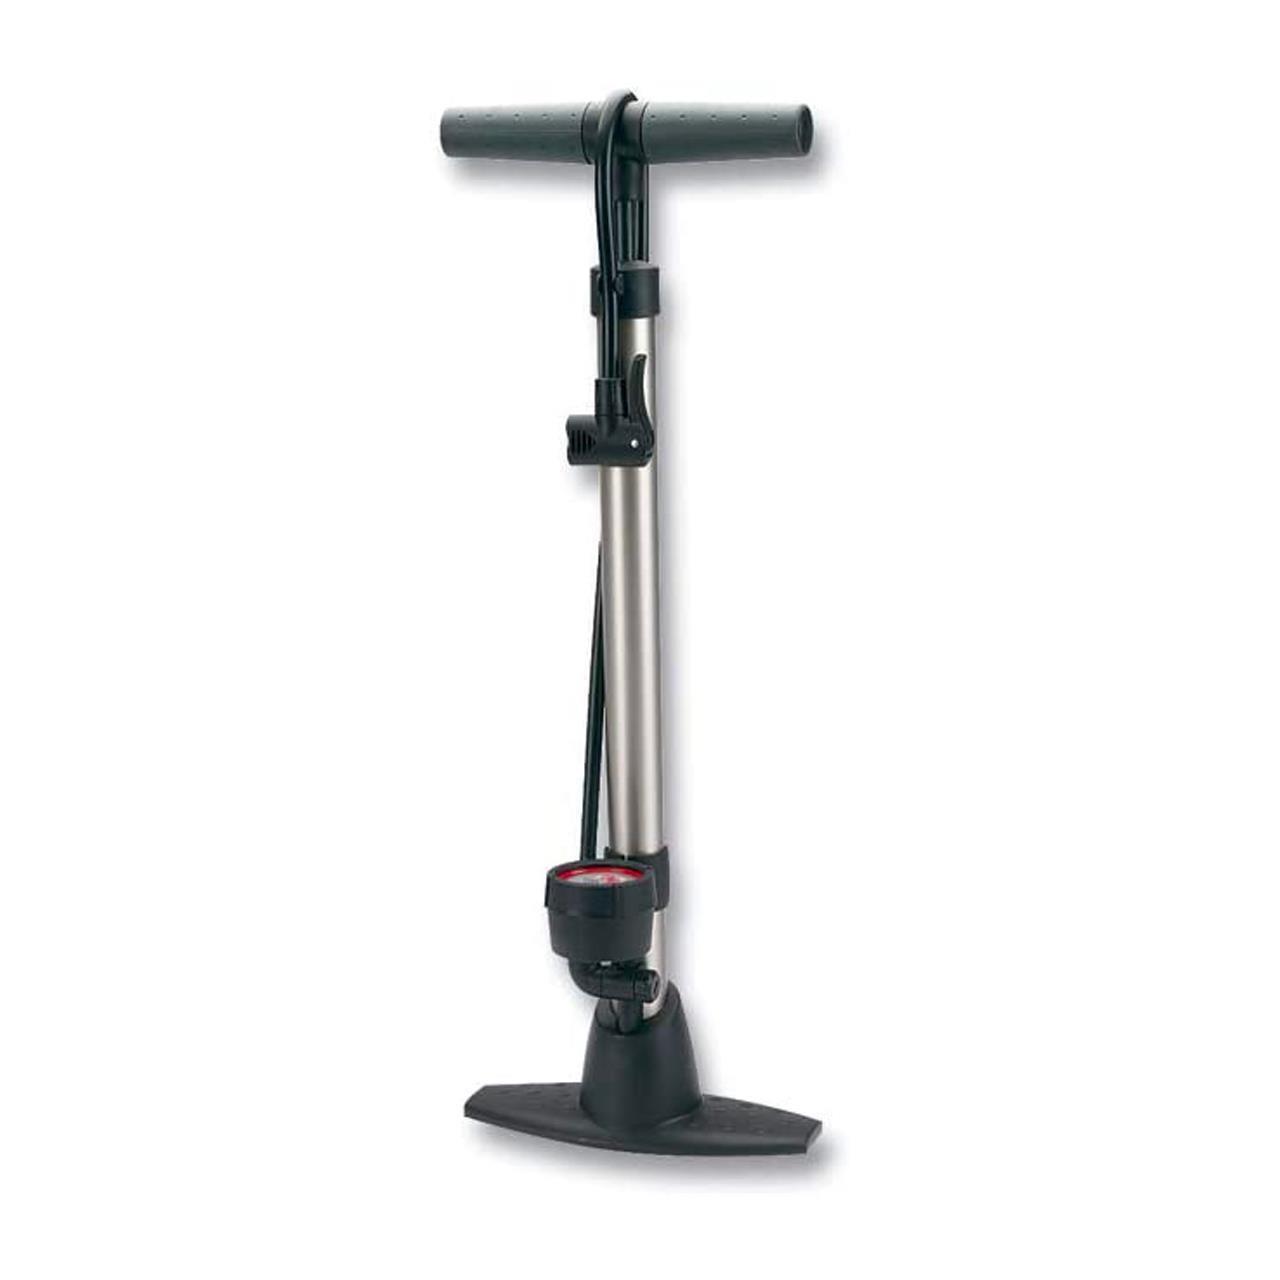 Raleigh RMJ513 Floor Pump (Silver/Grey)